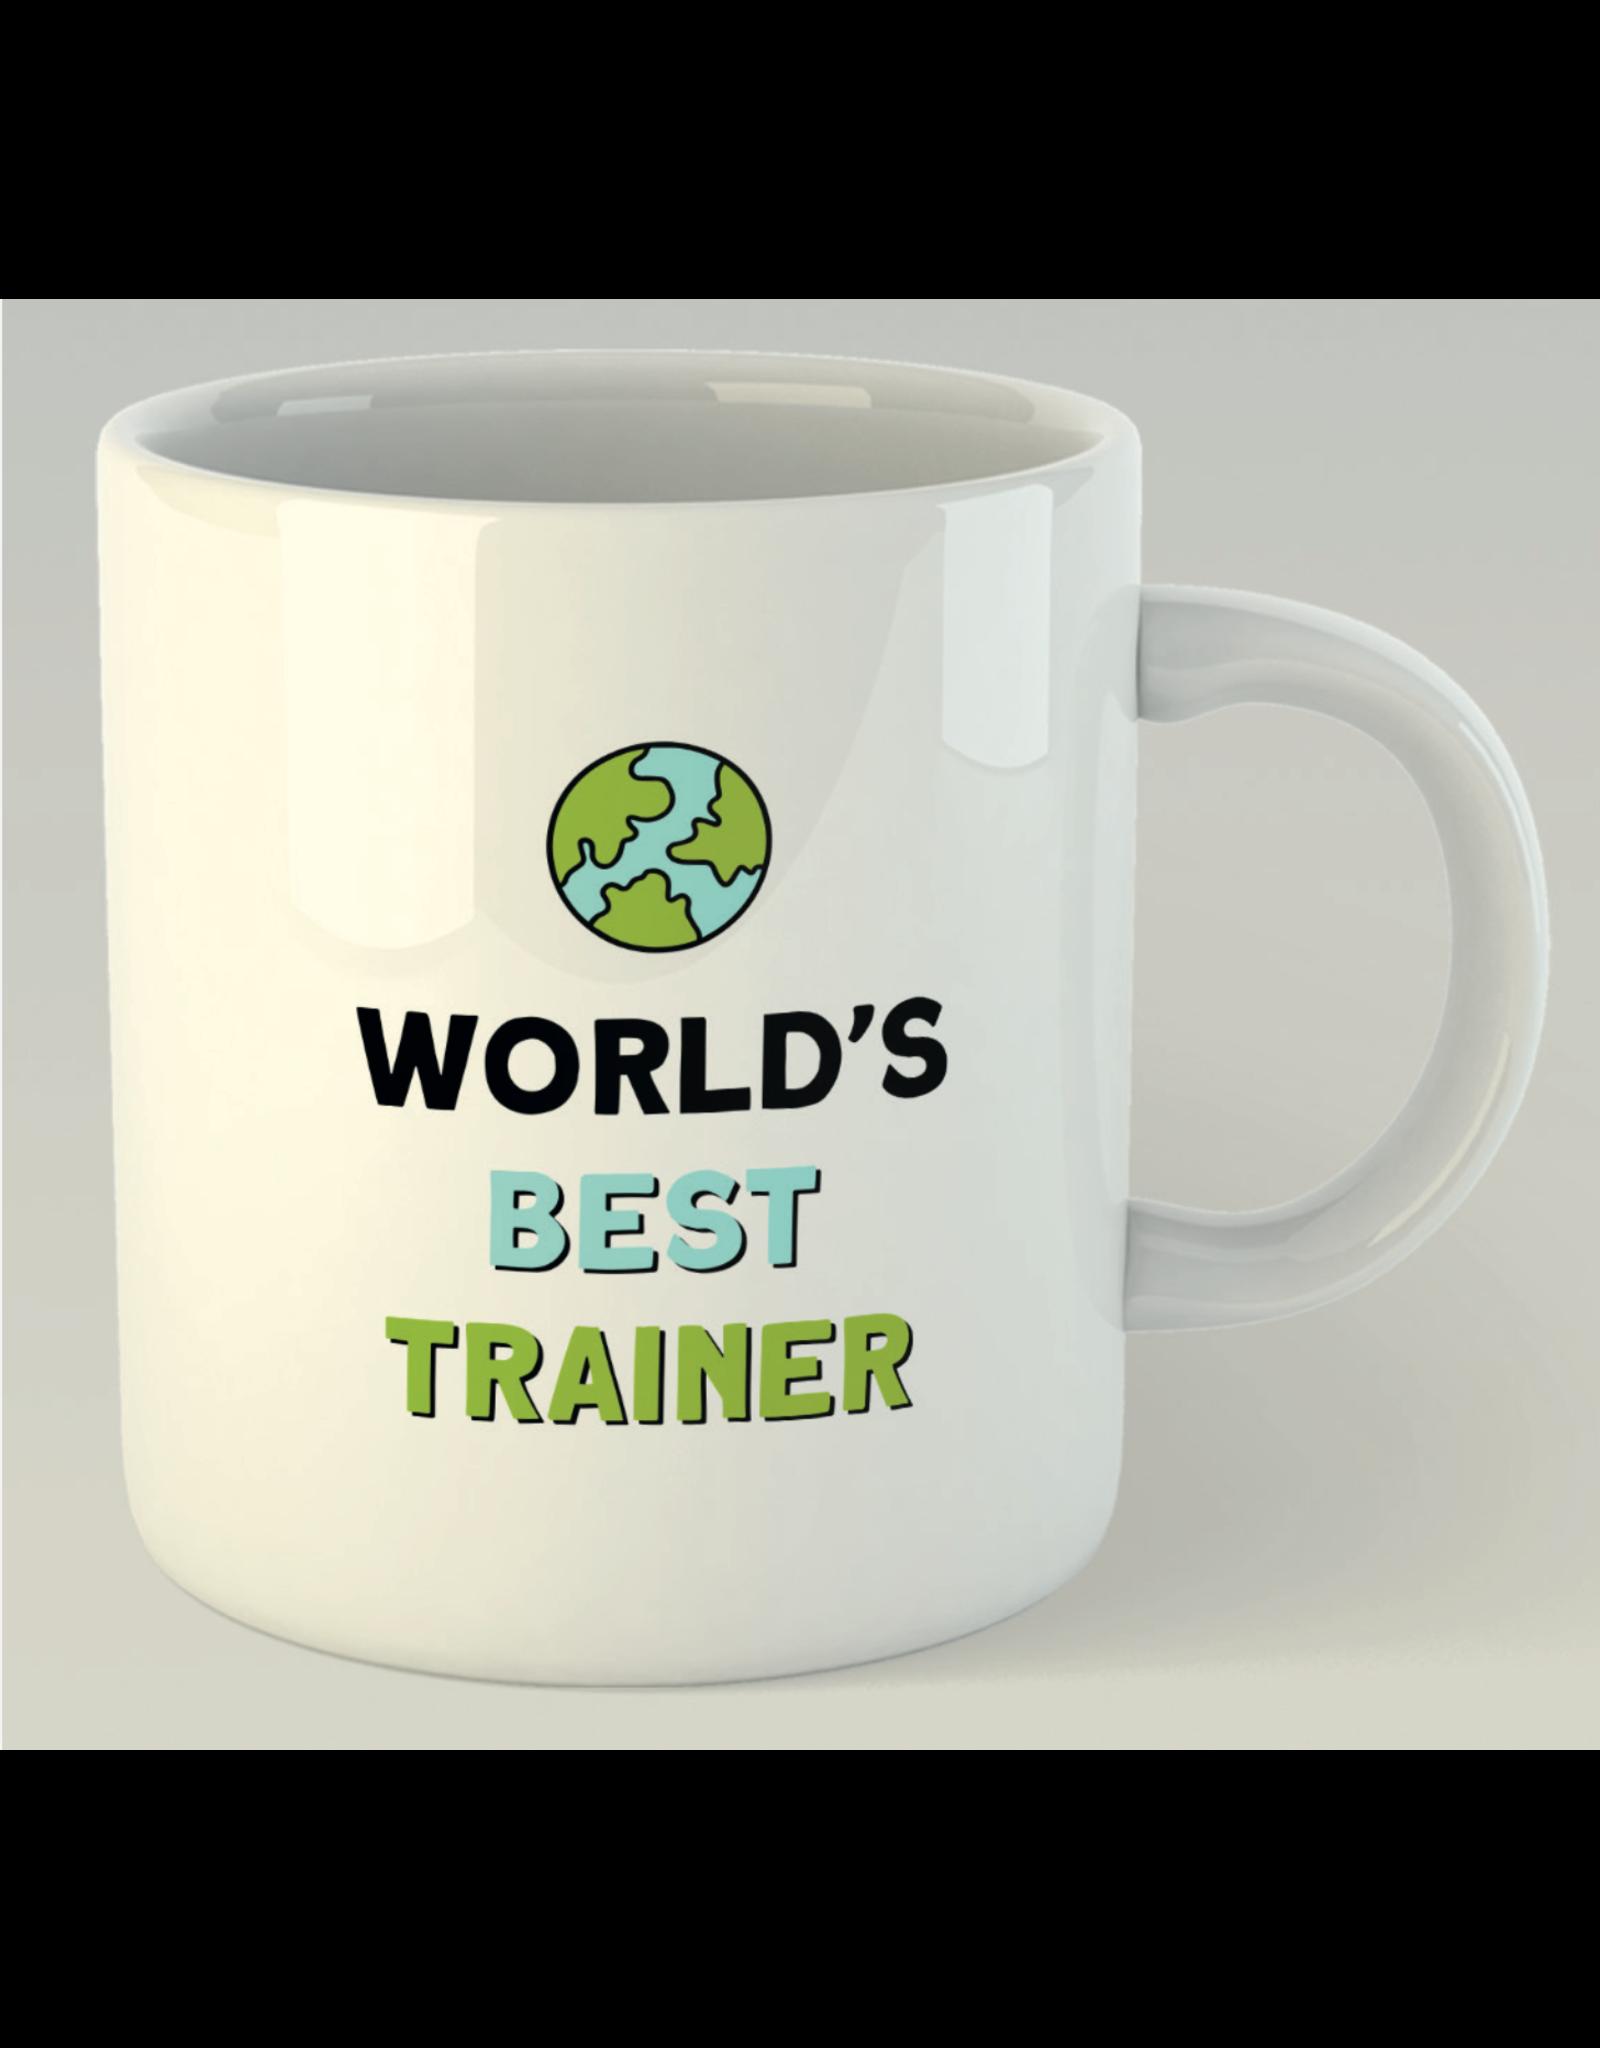 Jelly Jazz mug with text: world's best trainer